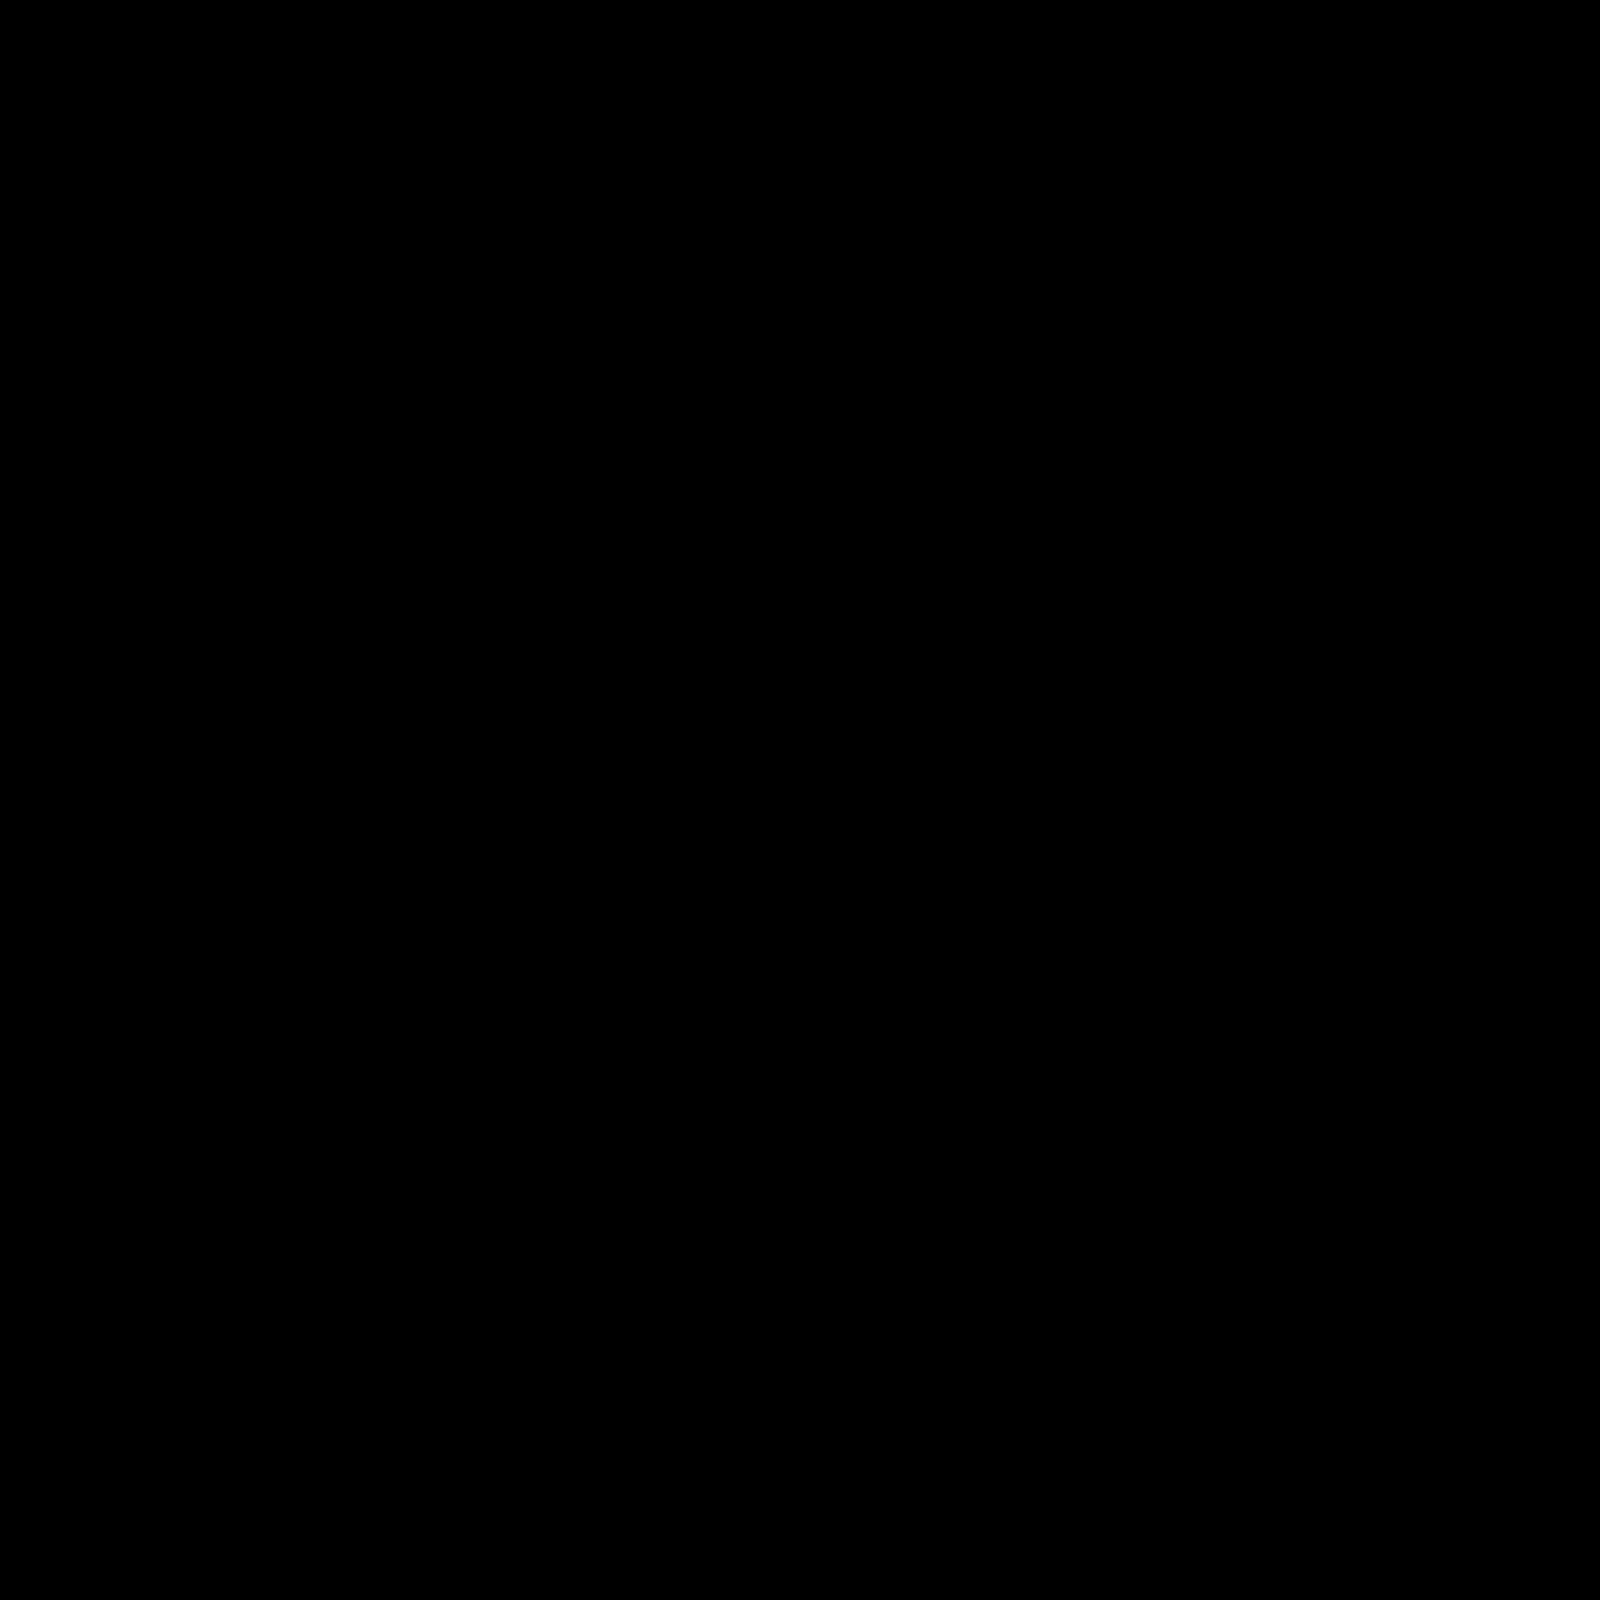 Vector Electricity